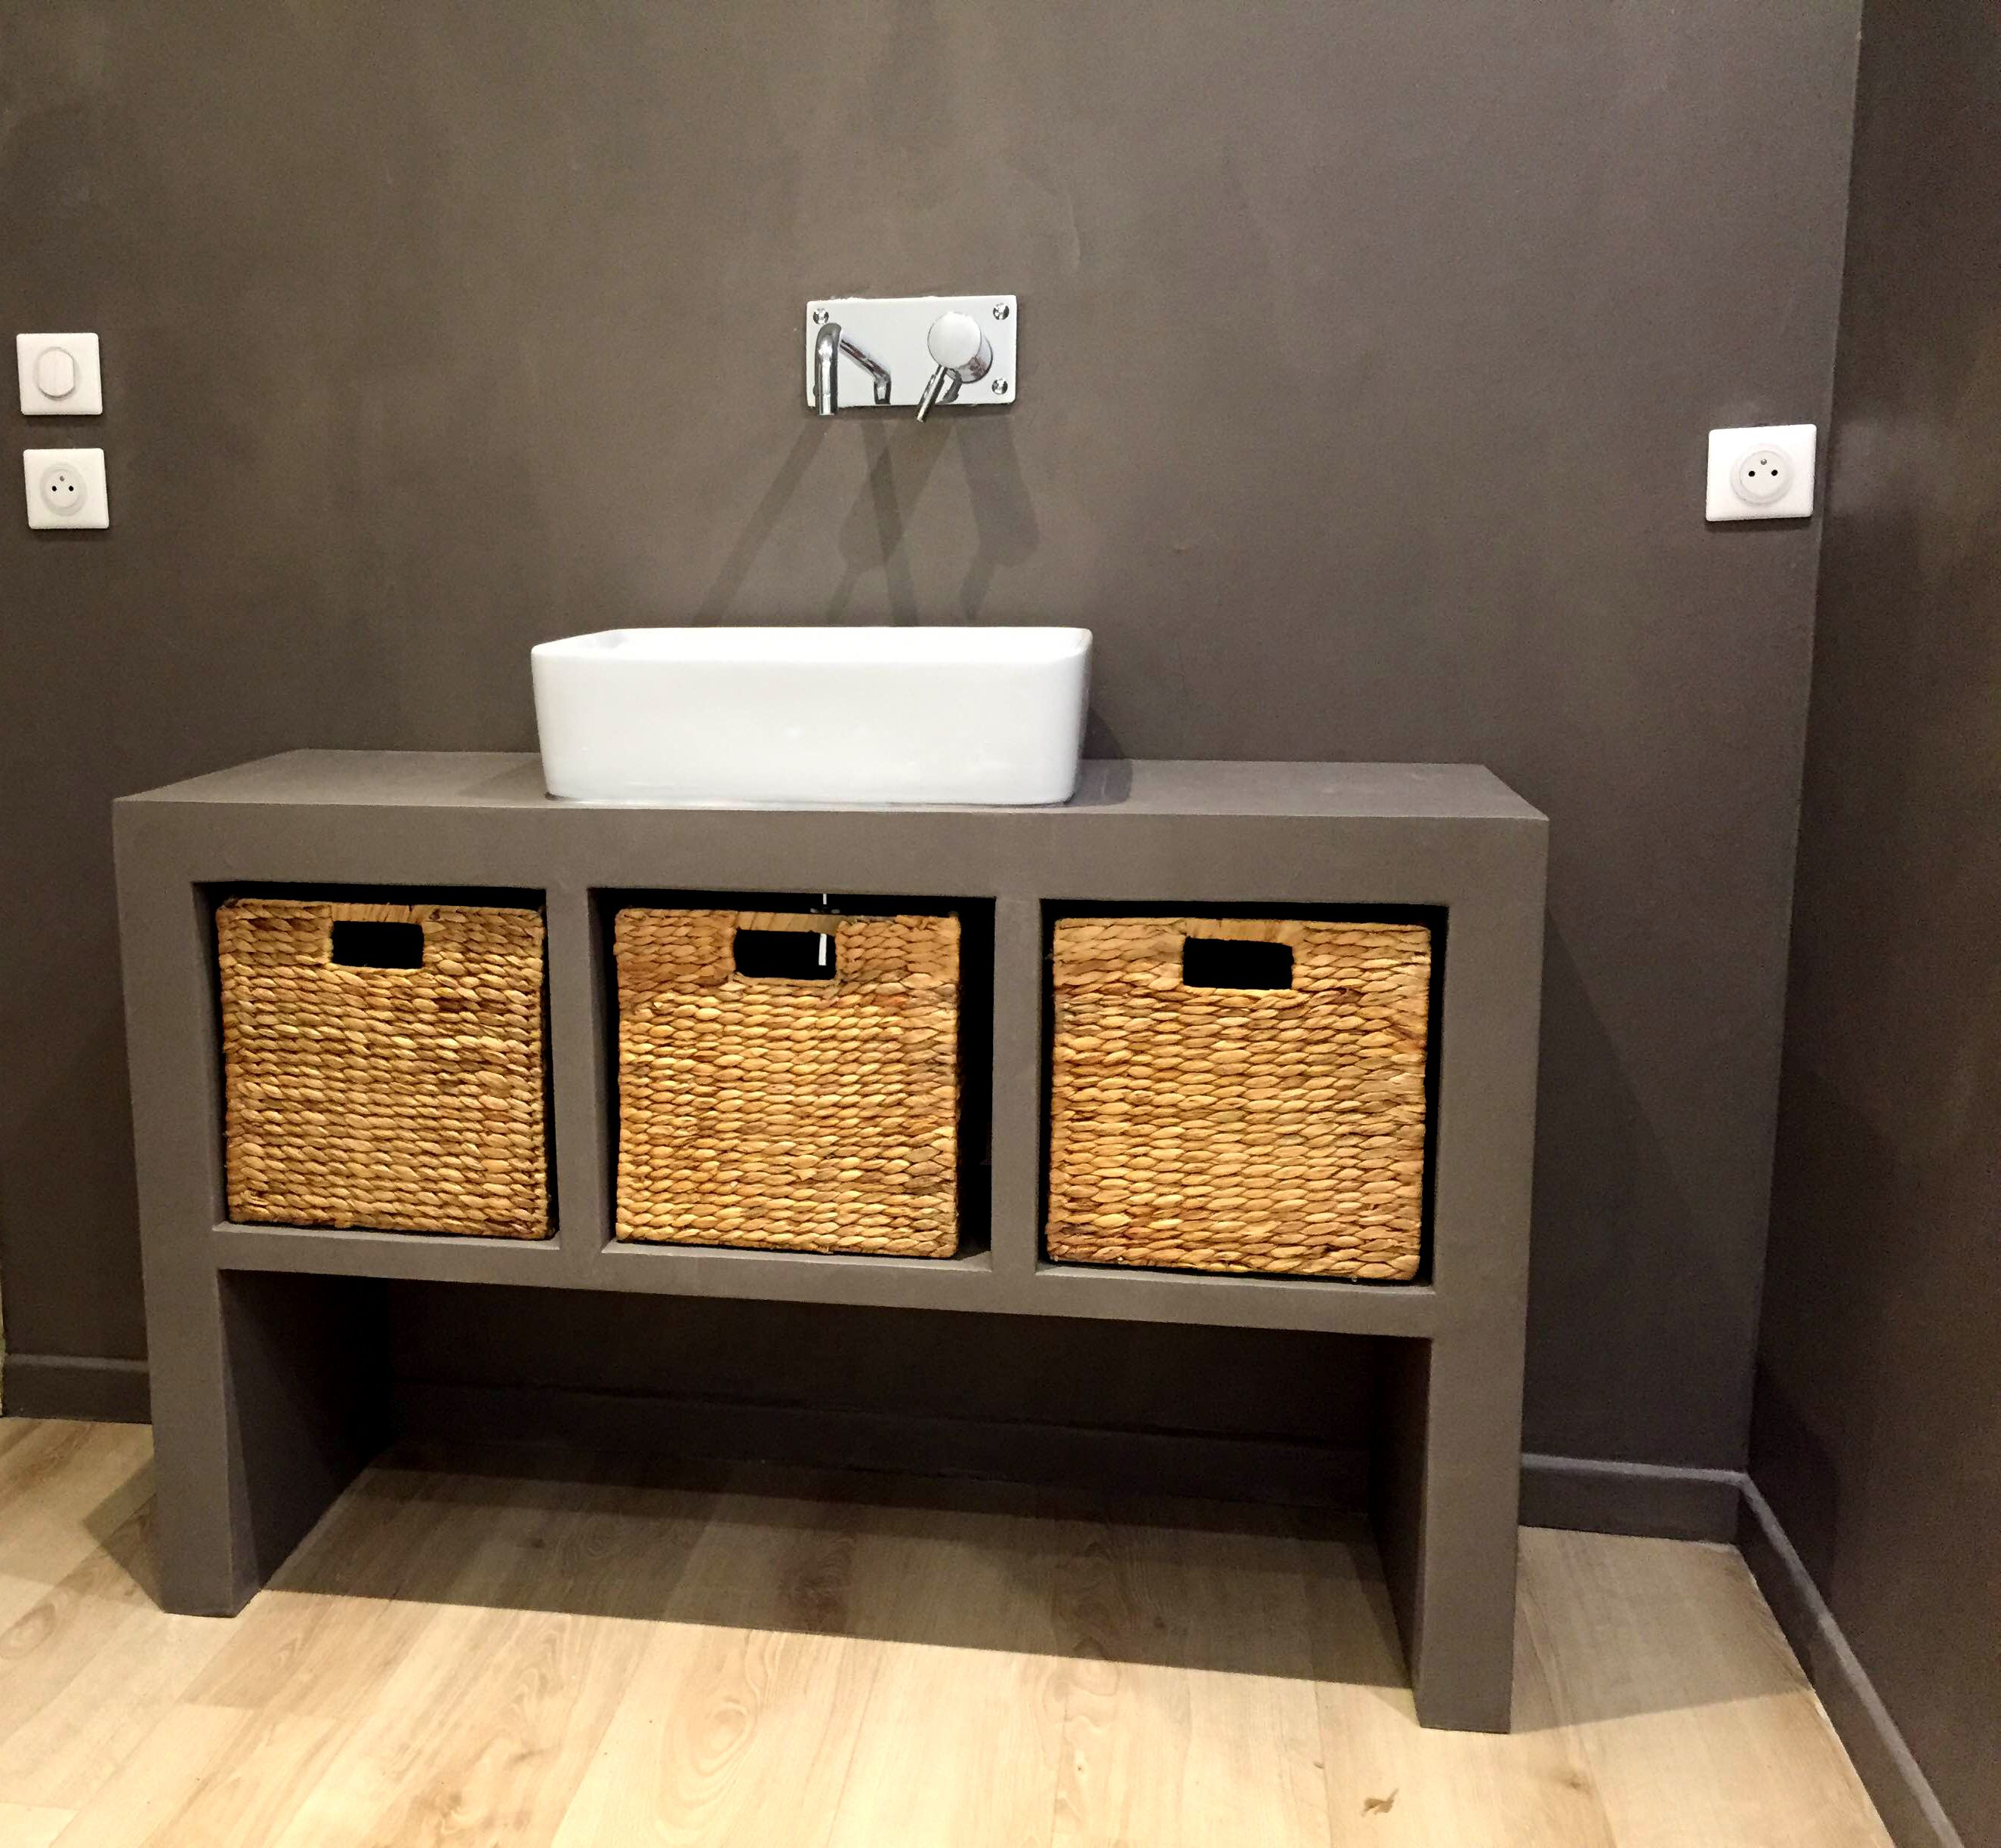 Meuble En Béton Ciré réalisation: concrete design, meuble de salle de bain en